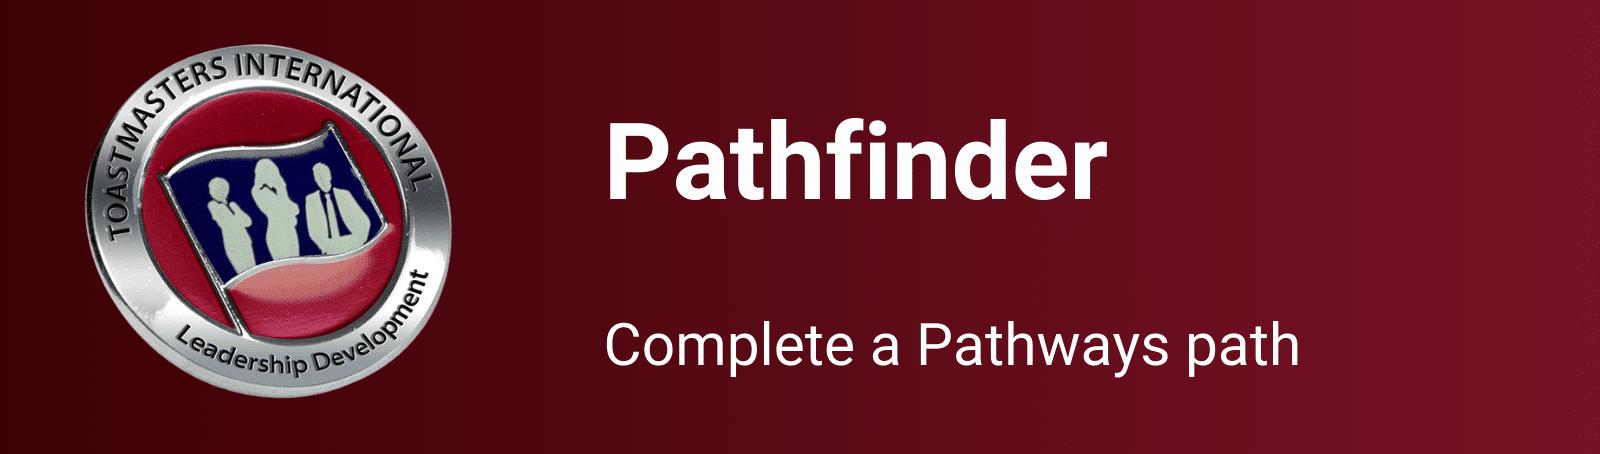 Pathfinder award